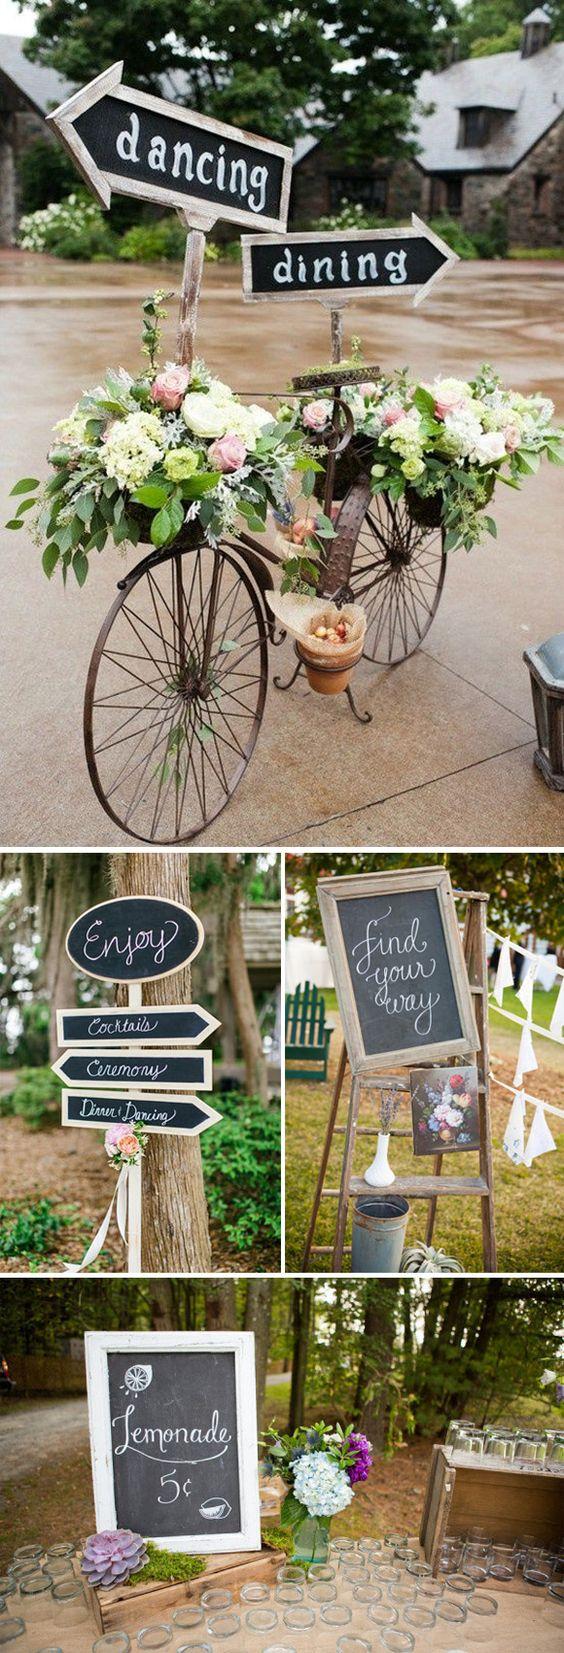 Carteles originales para tu boda